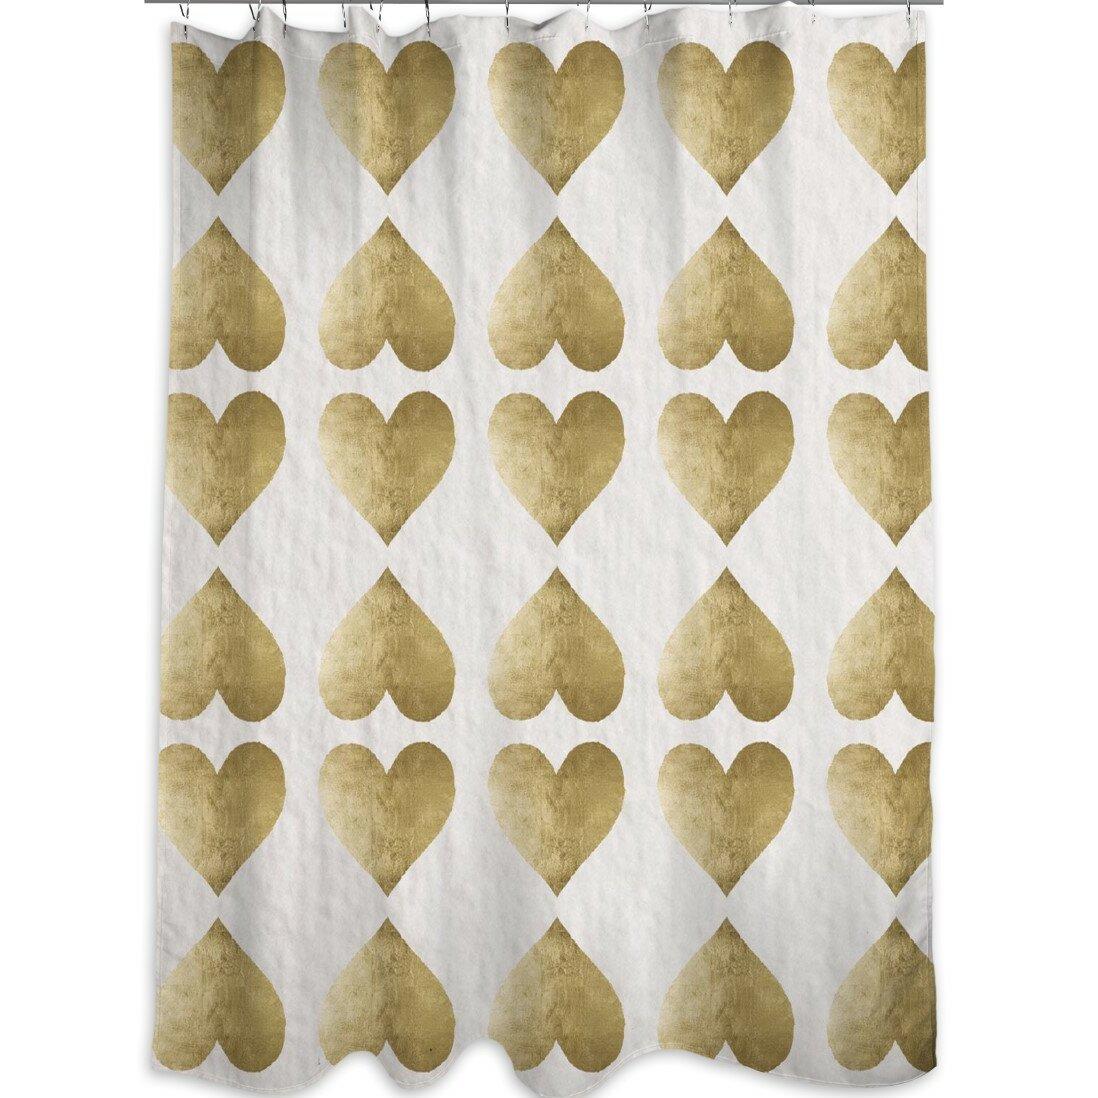 Octopus shower curtain etsy - Love Game Shower Curtain 108 99 Wayfair